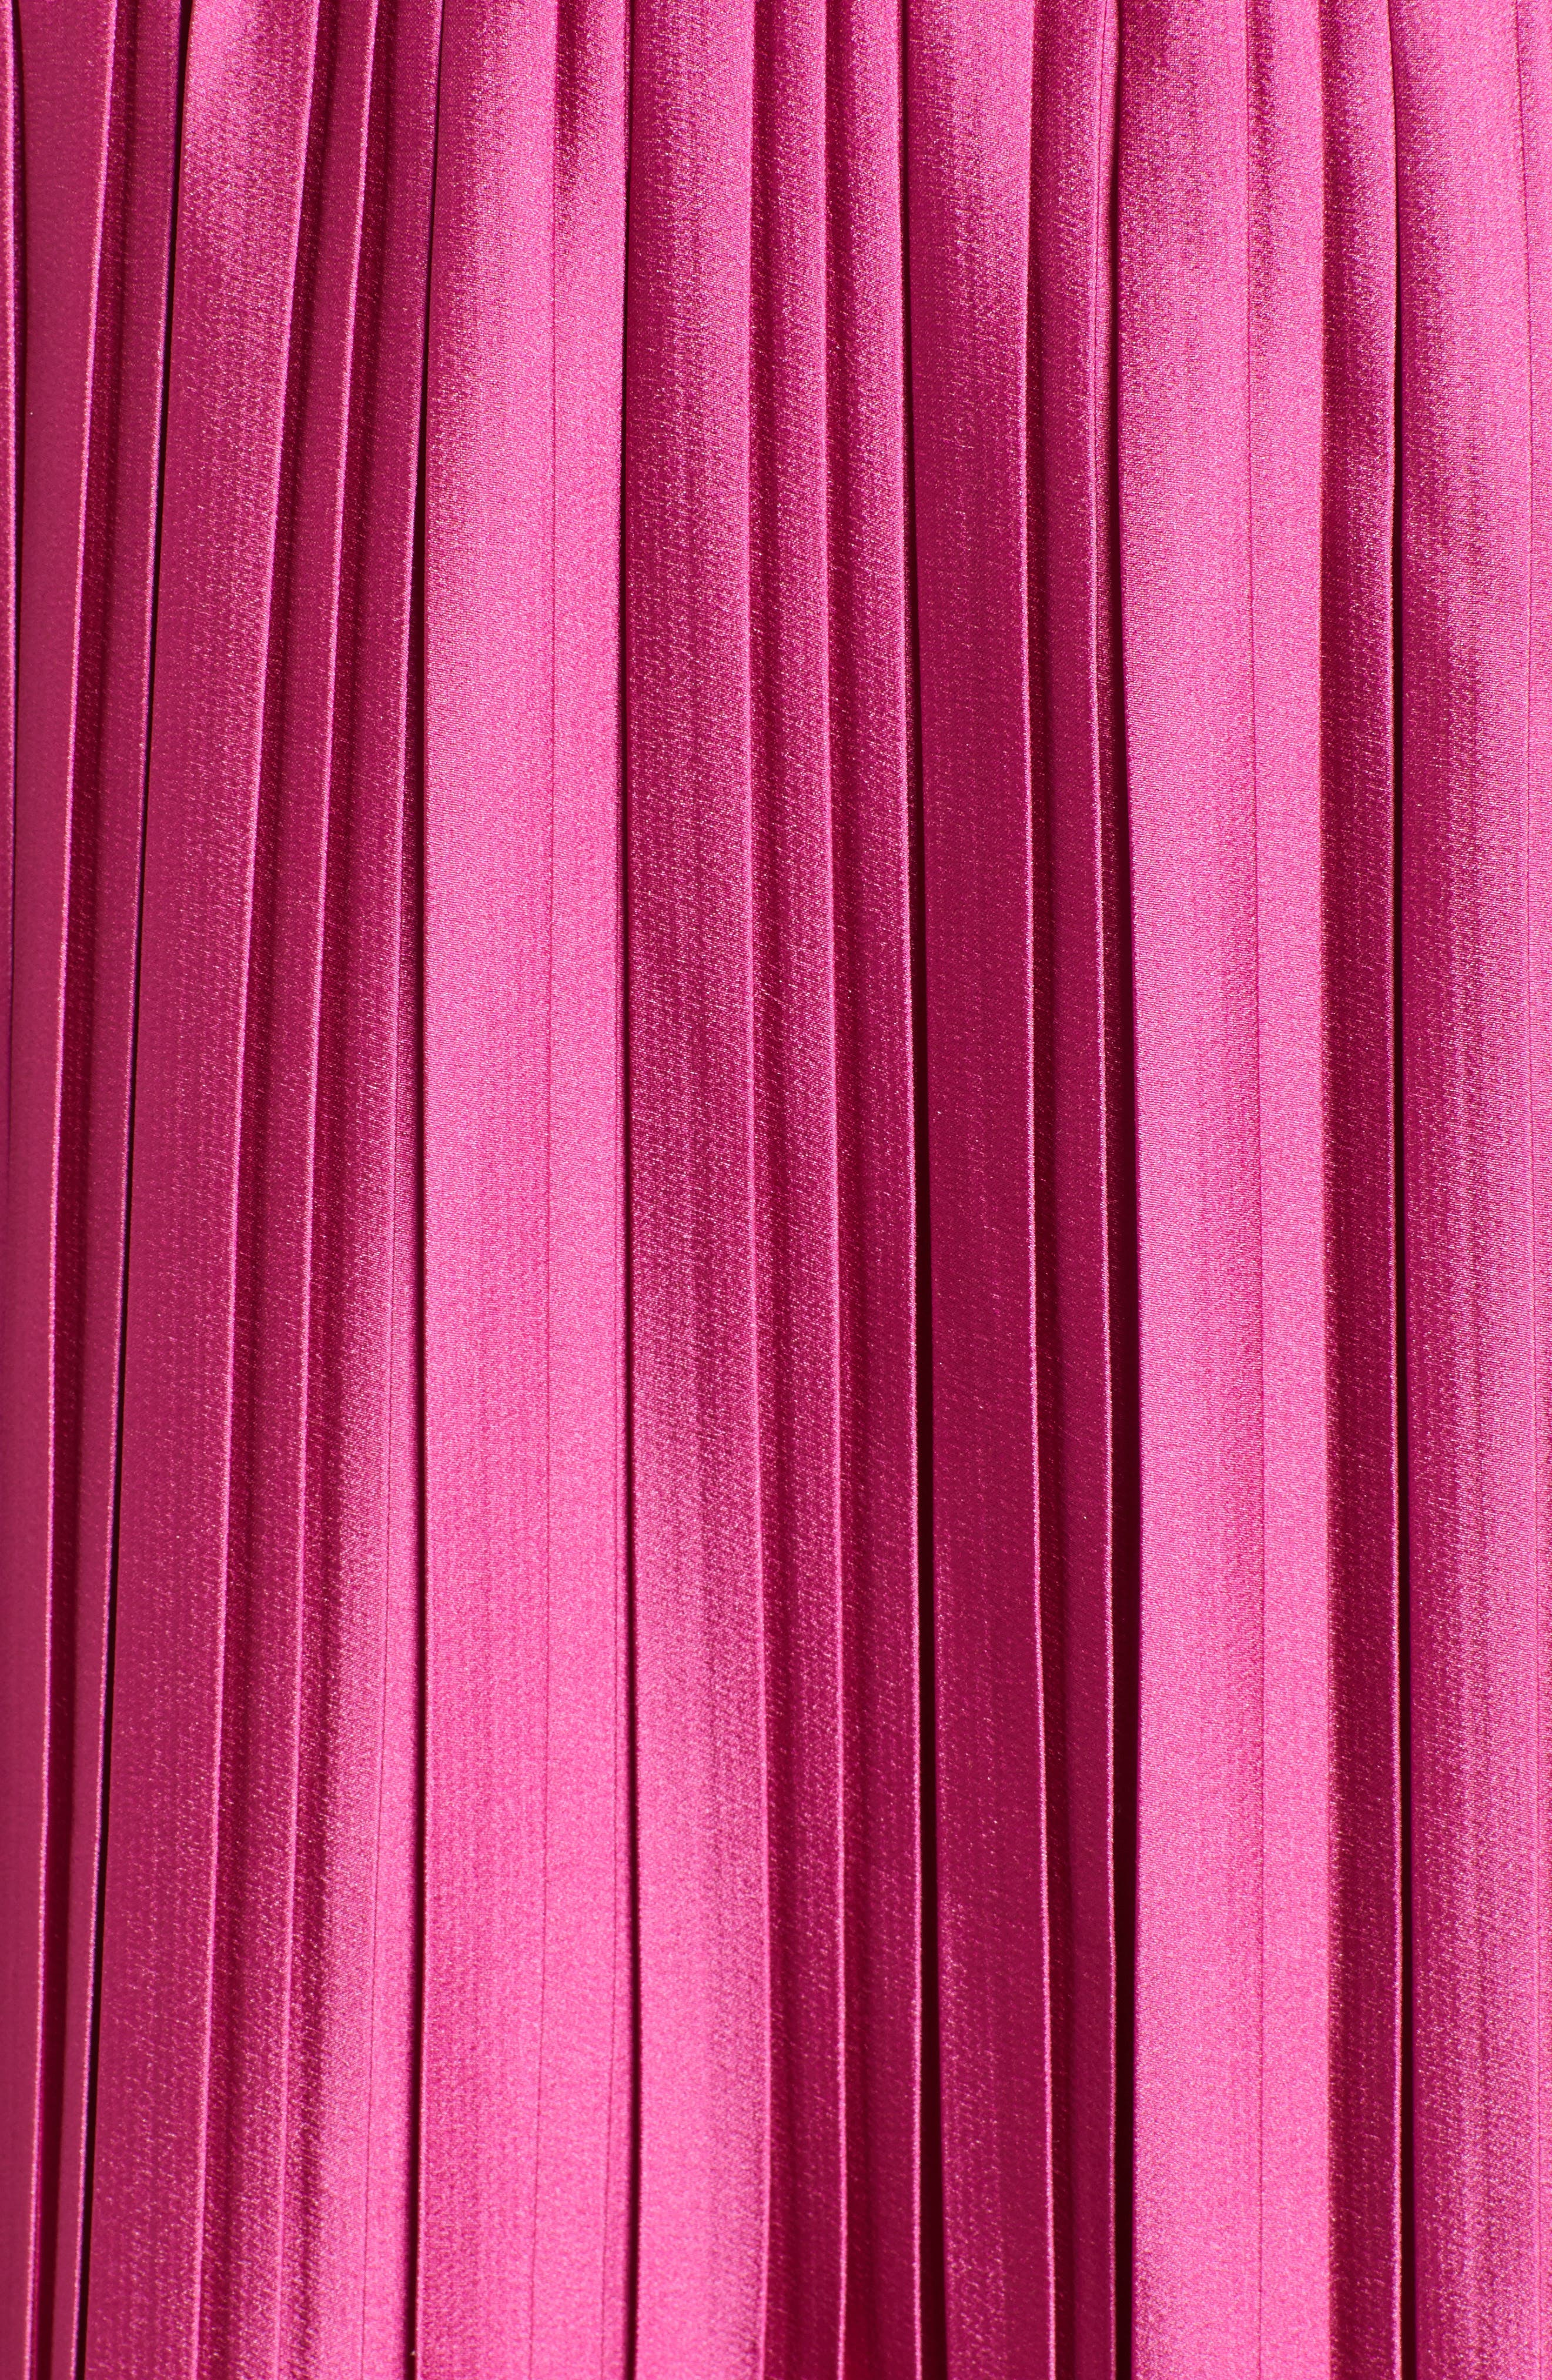 Niti Pleated Skirt,                             Alternate thumbnail 5, color,                             FESTIVAL FUCHSIA